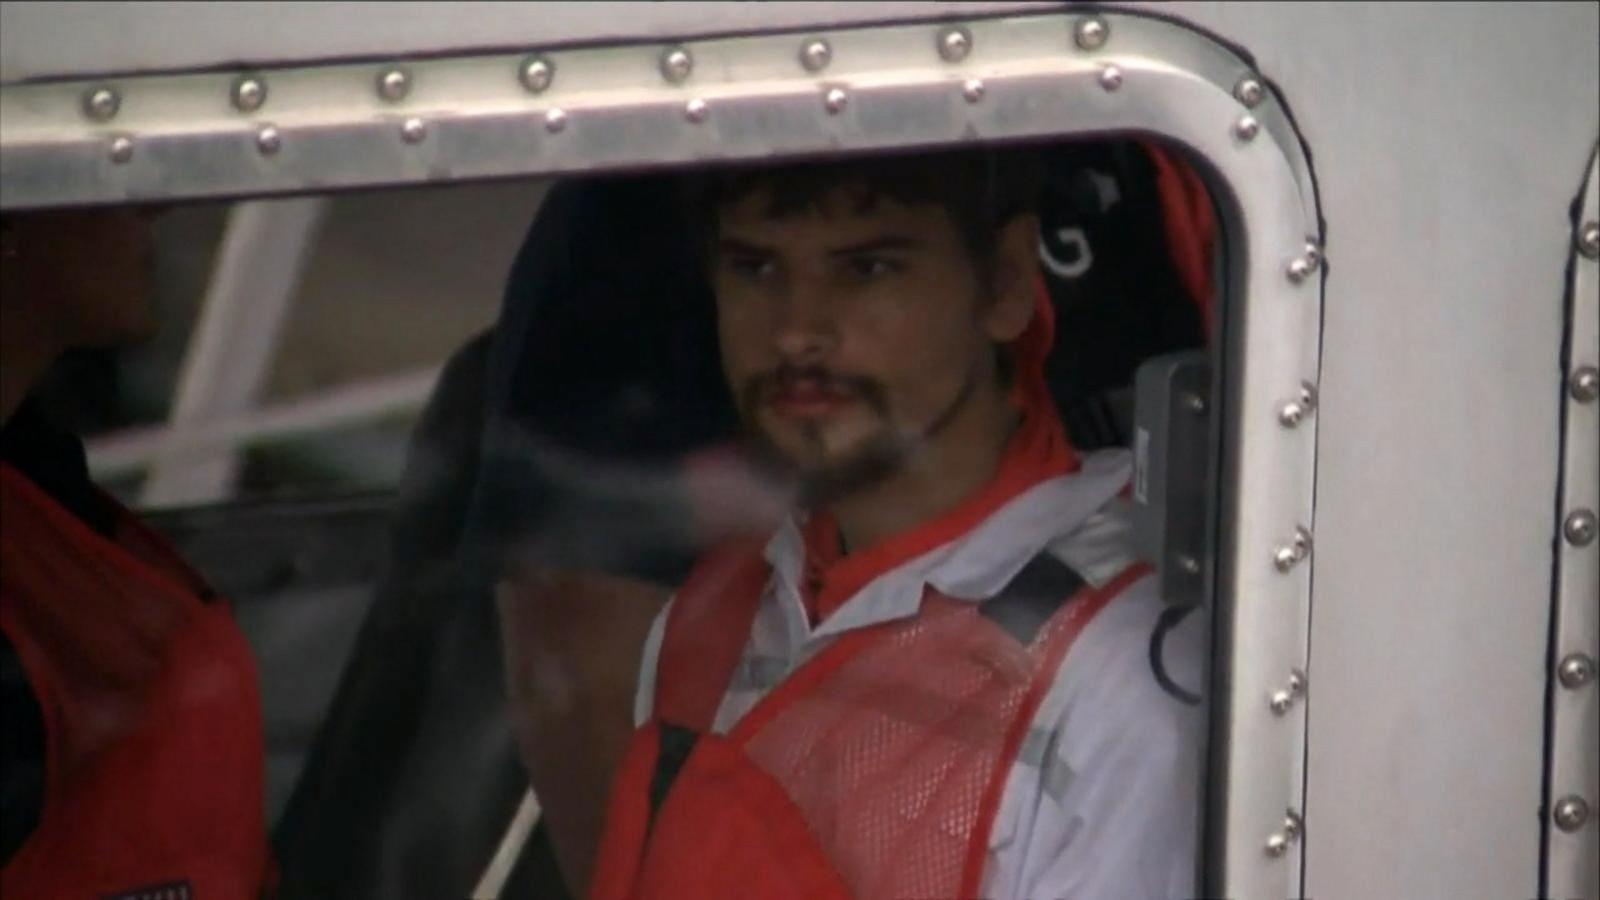 Nathan Carman, 22, was found on an inflatable raft off Martha's Vineyard.